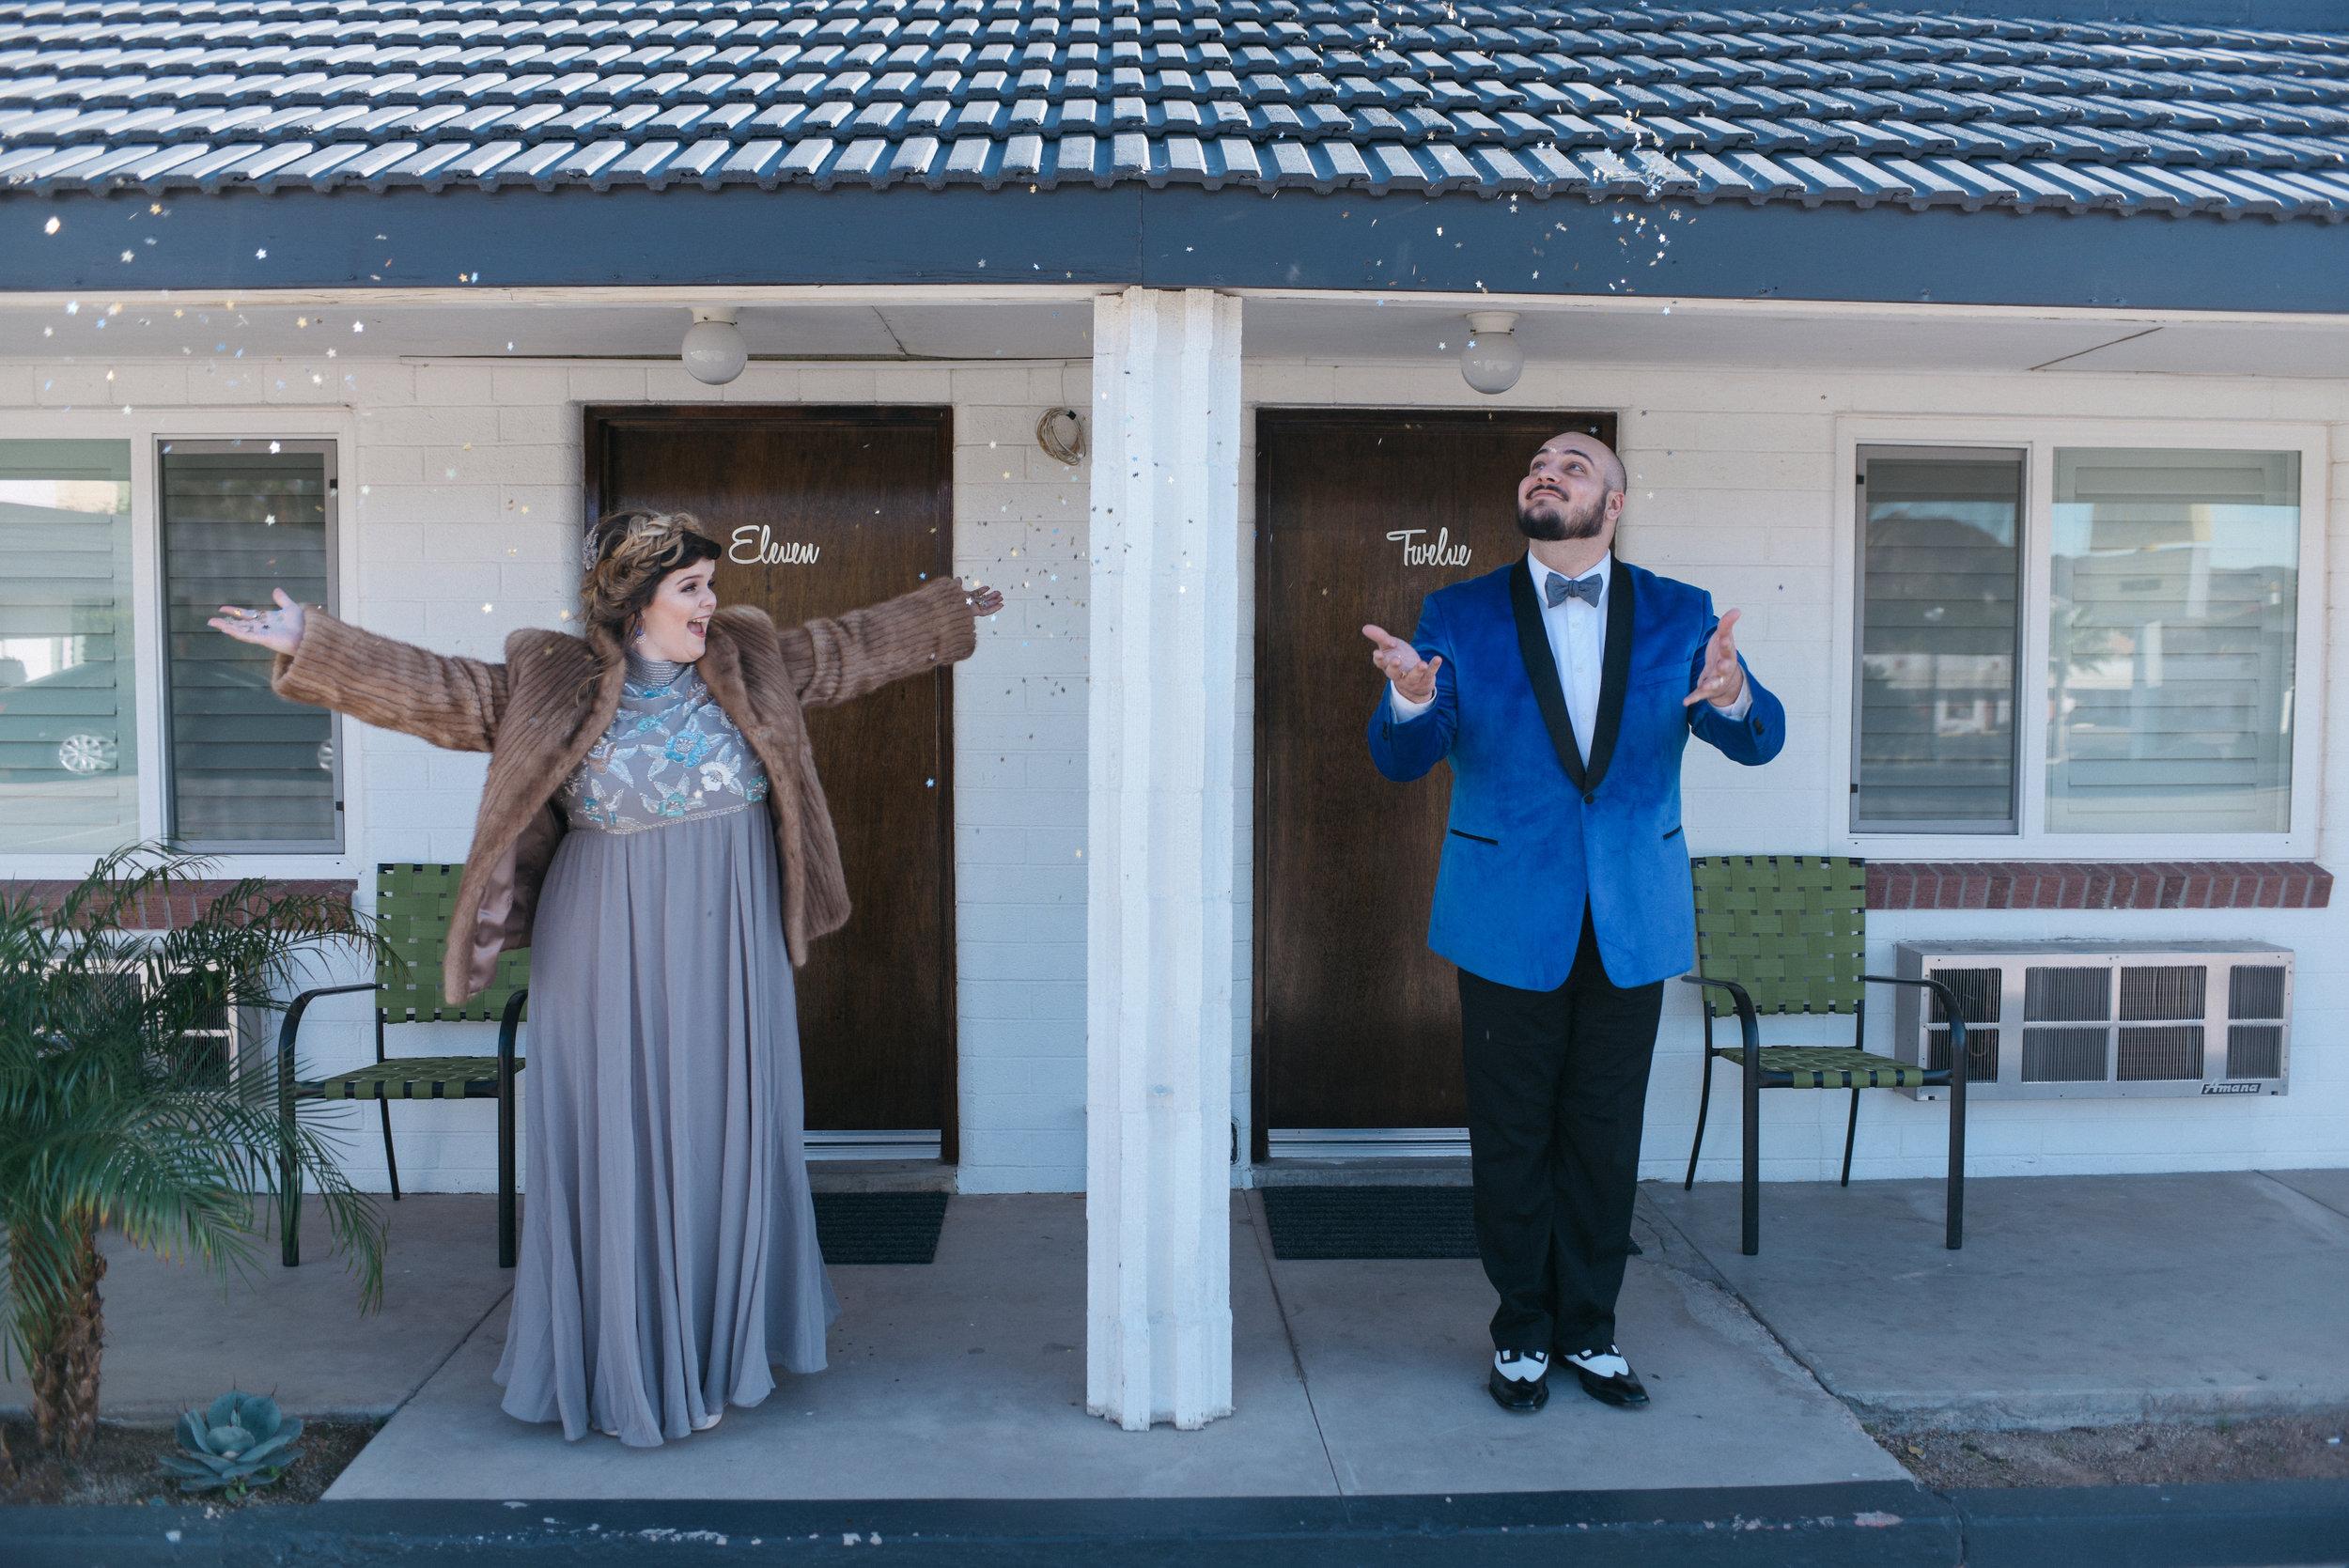 las vegas wedding, Elvis wedding, wedding las vegas, vintage wedding, vintage bride style, bridal style, fur wedding dress, vintage fur, desert wedding,